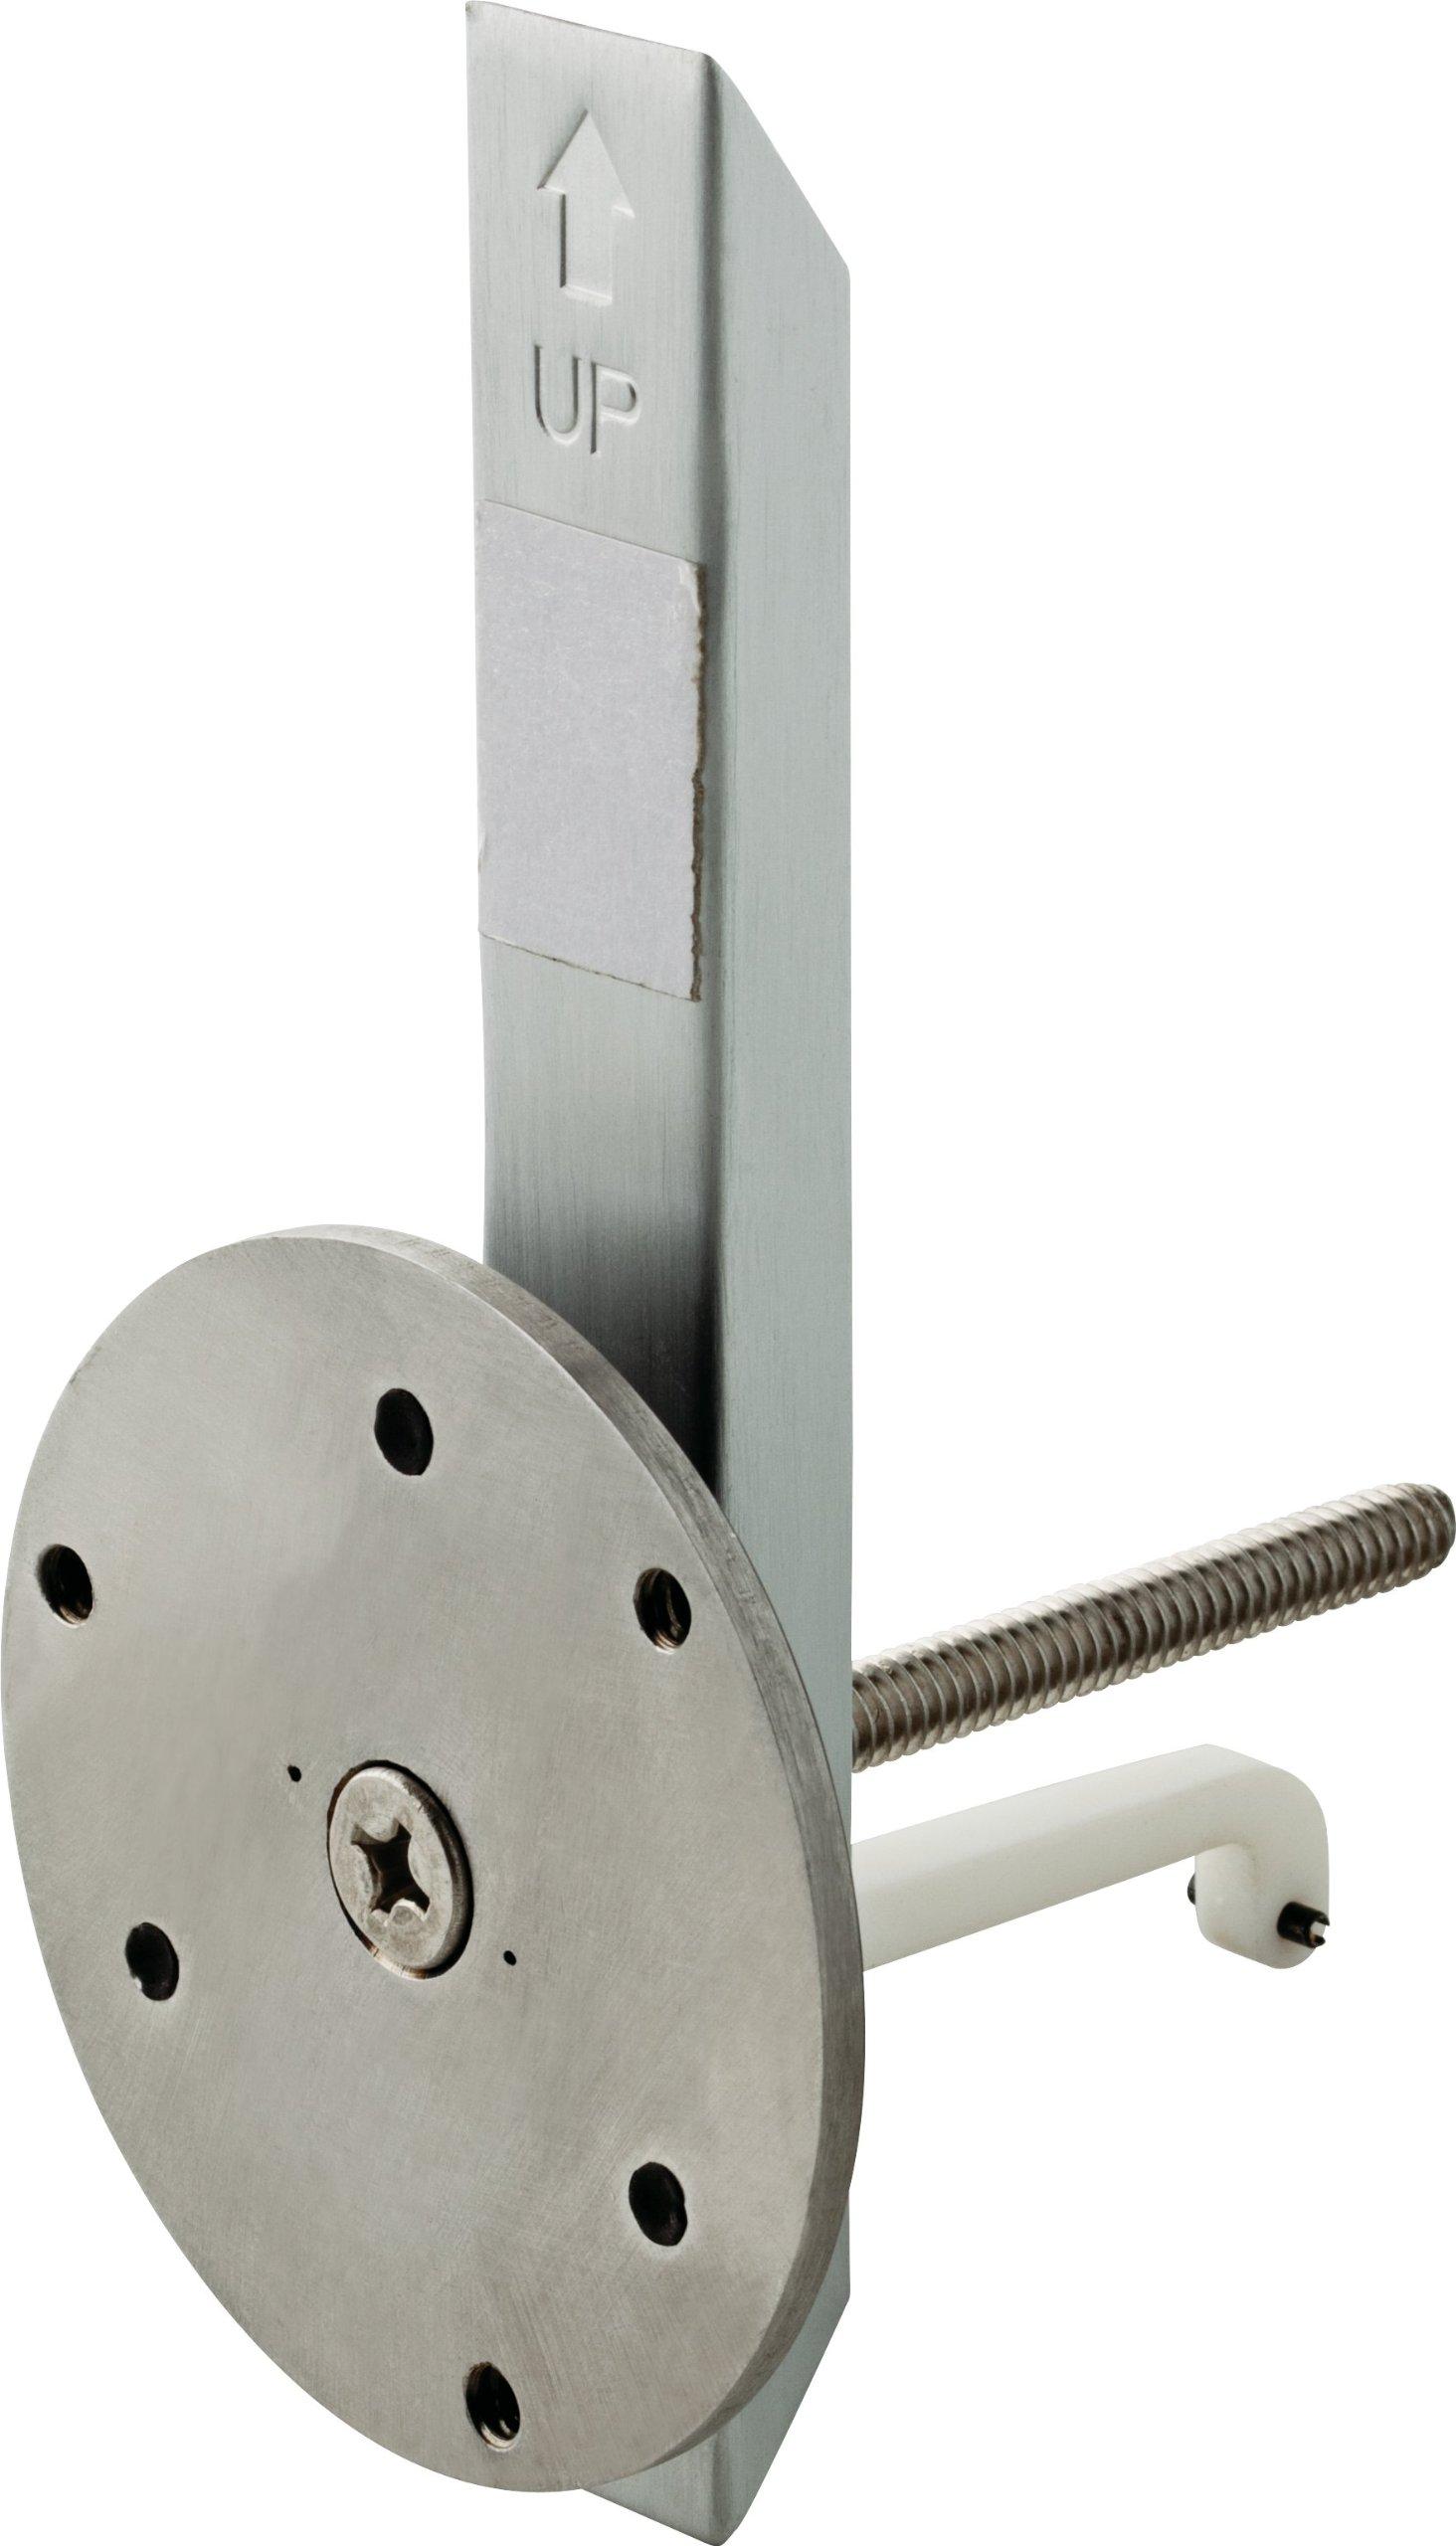 Delta Faucet RP72402 Grab Bar Wall Anchor